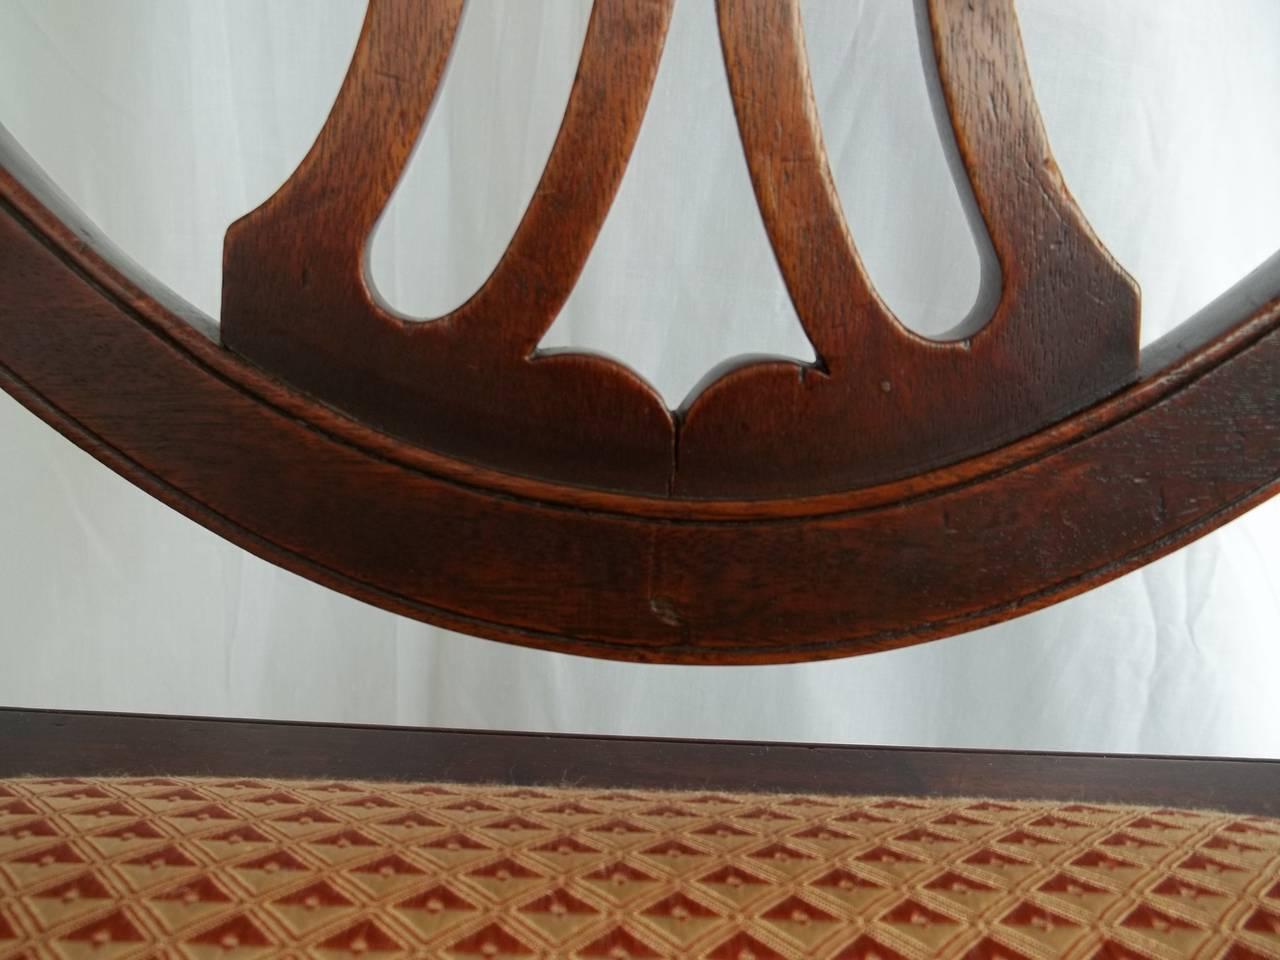 Elegant 18th Century Hepplewhite Side Chair in Mahogany, English circa 1785 For Sale 3